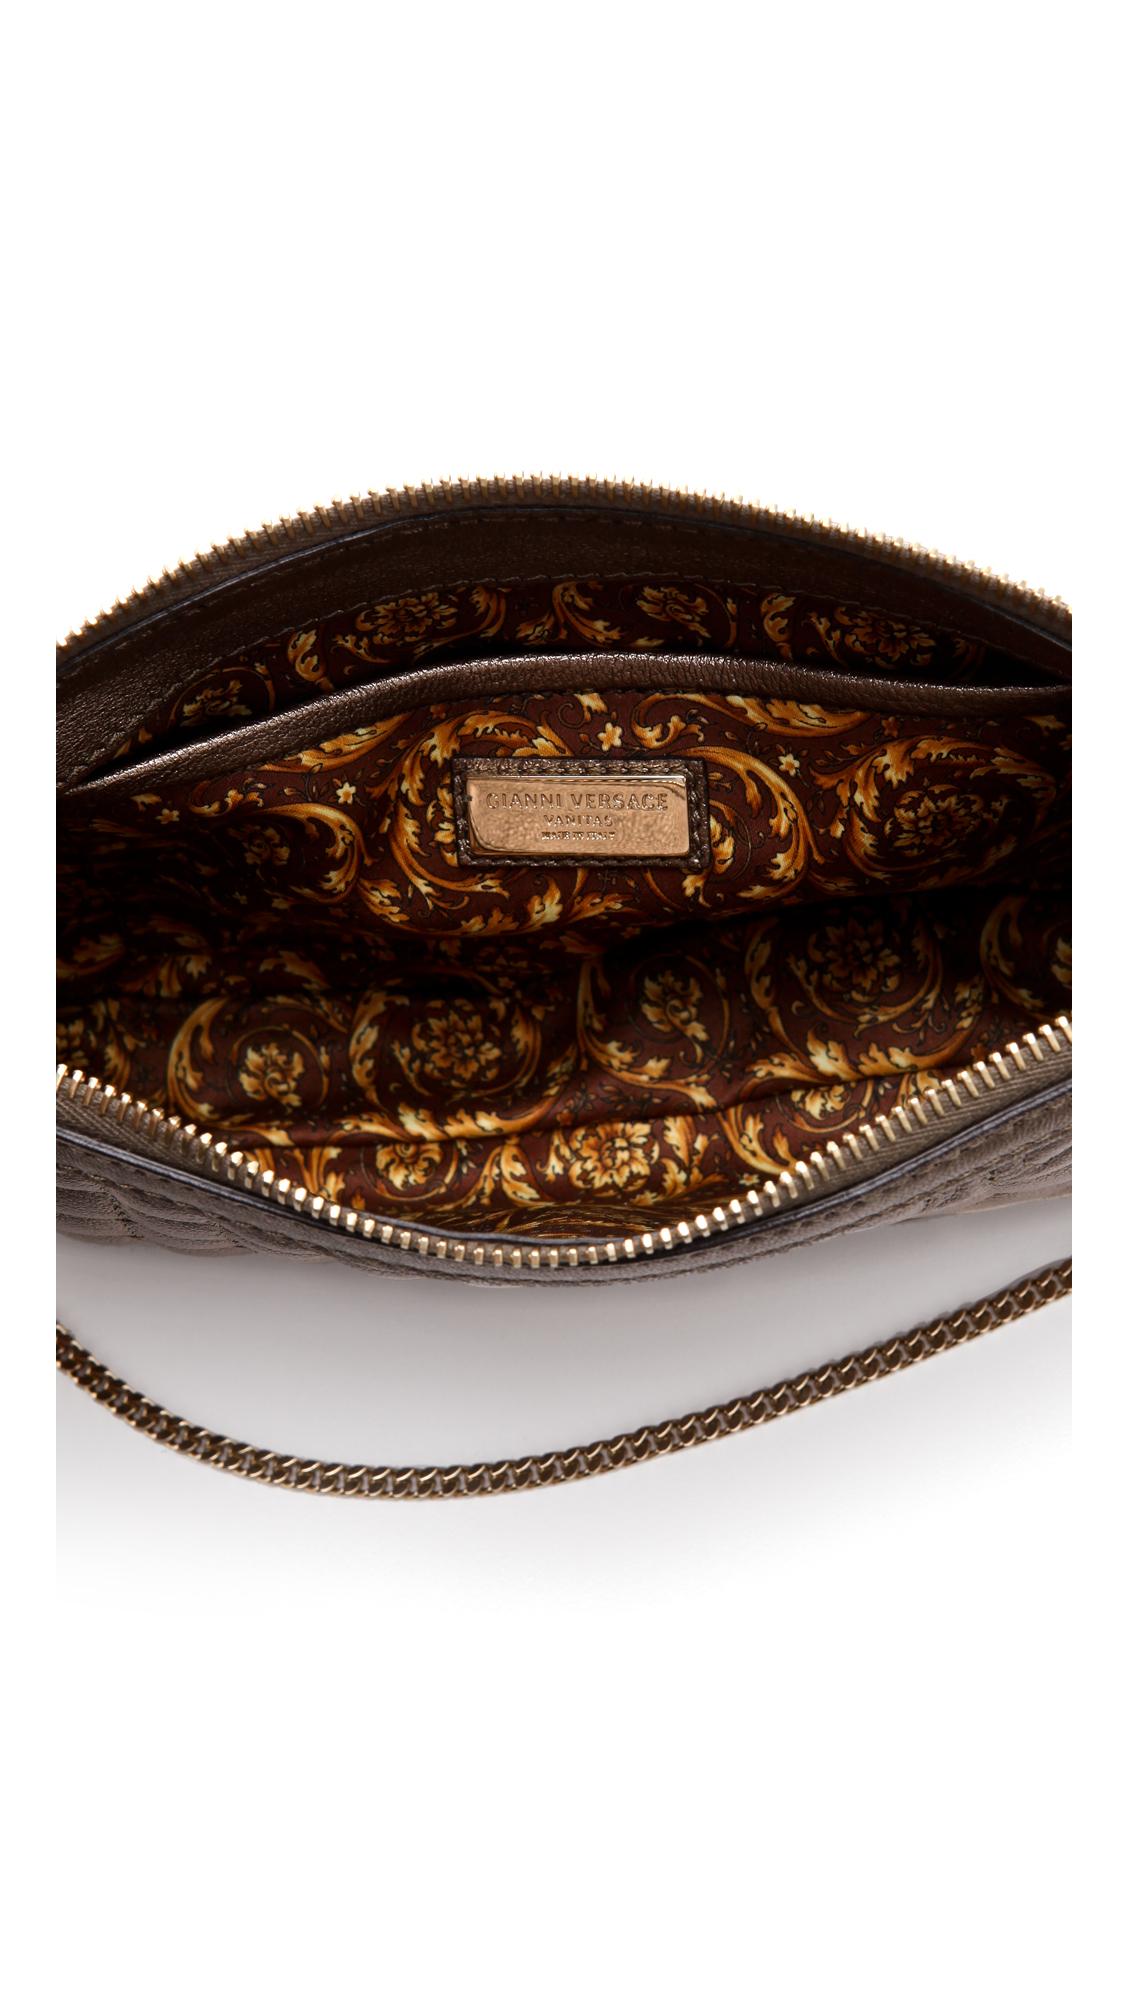 4cefdfced64d Versace Vanitas Quilted Handbag